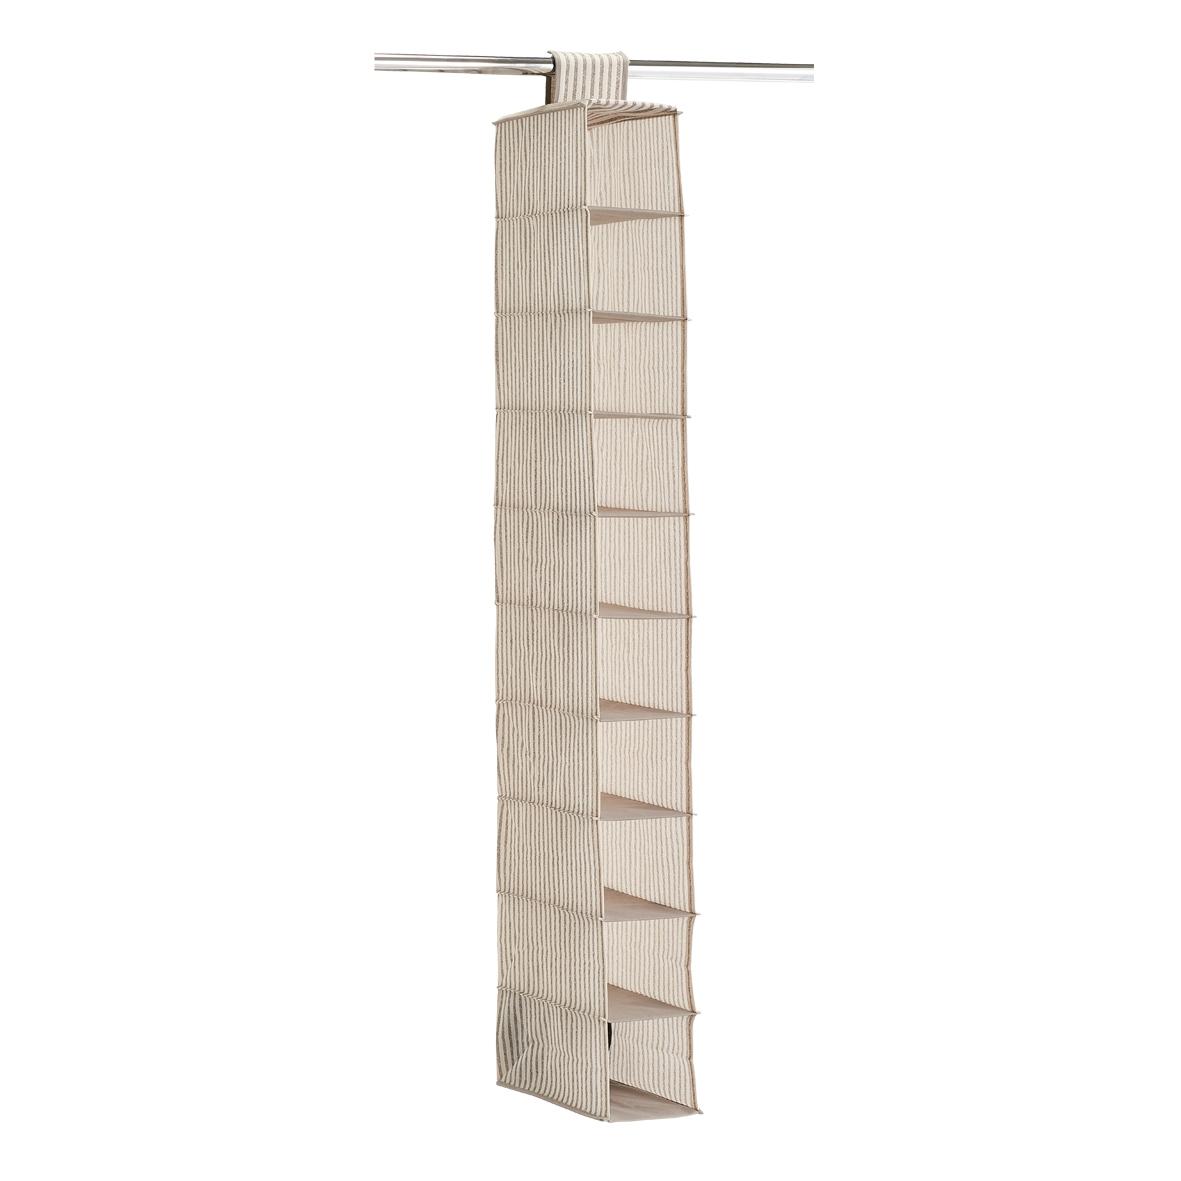 Organizator textil pentru dulap, Bej Stripes, l15xA30xH129 cm poza